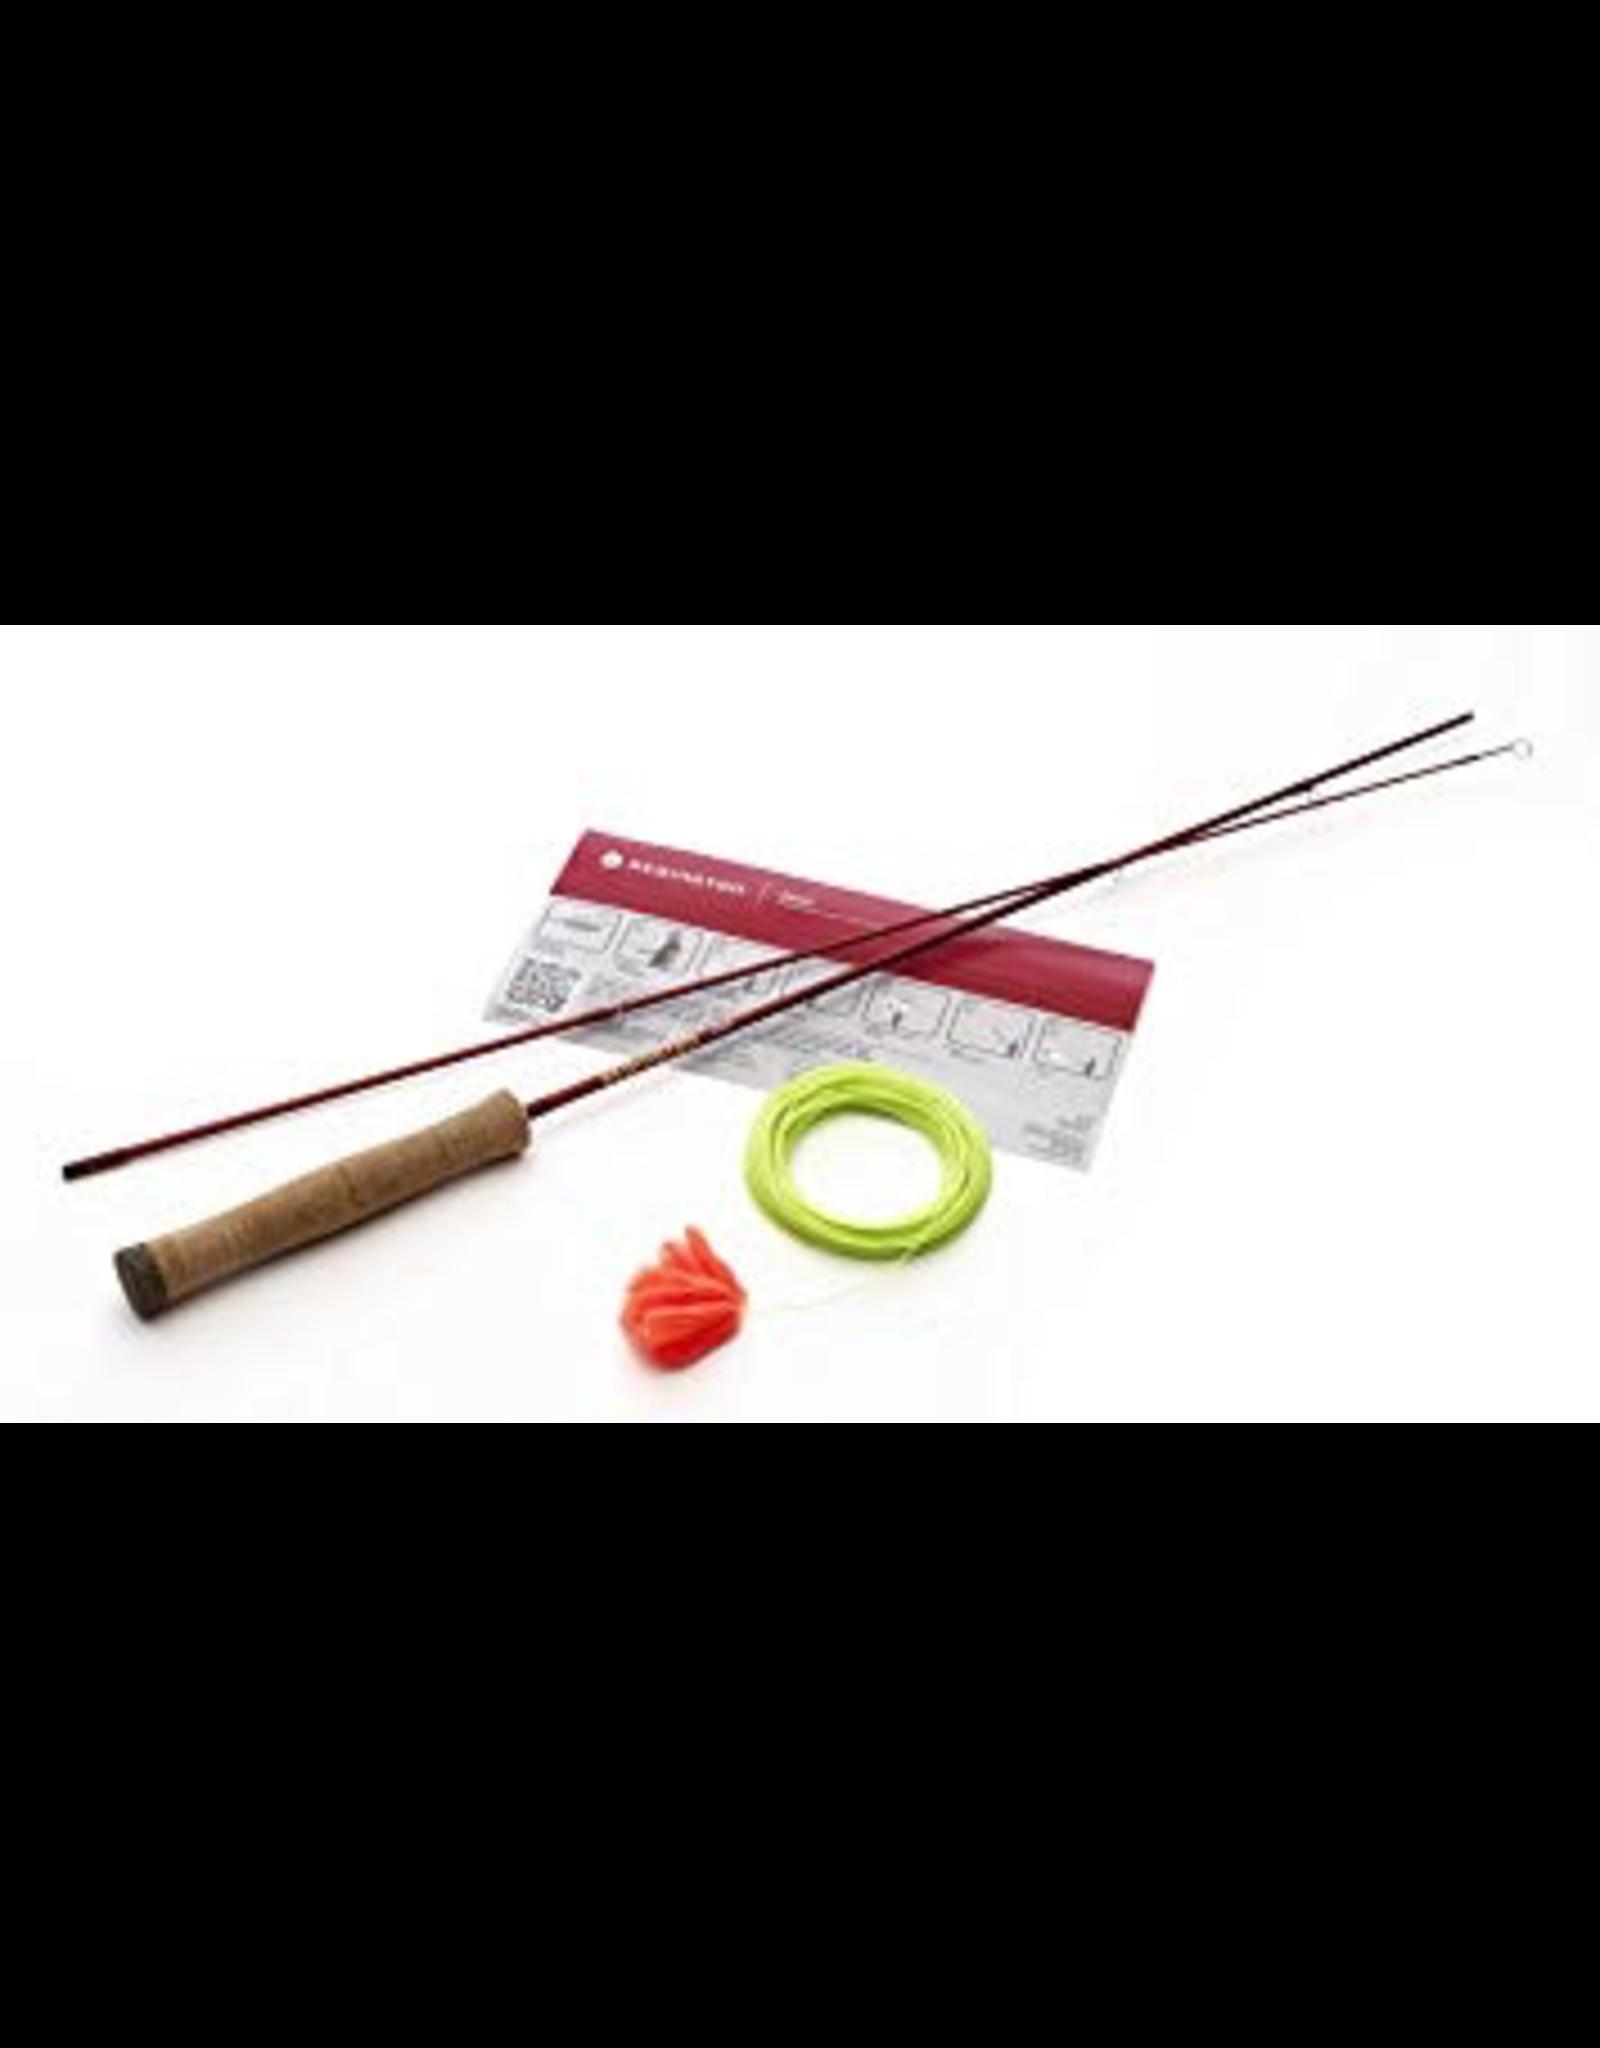 "Redington Form Game Rod 4'2"" w/ Line"